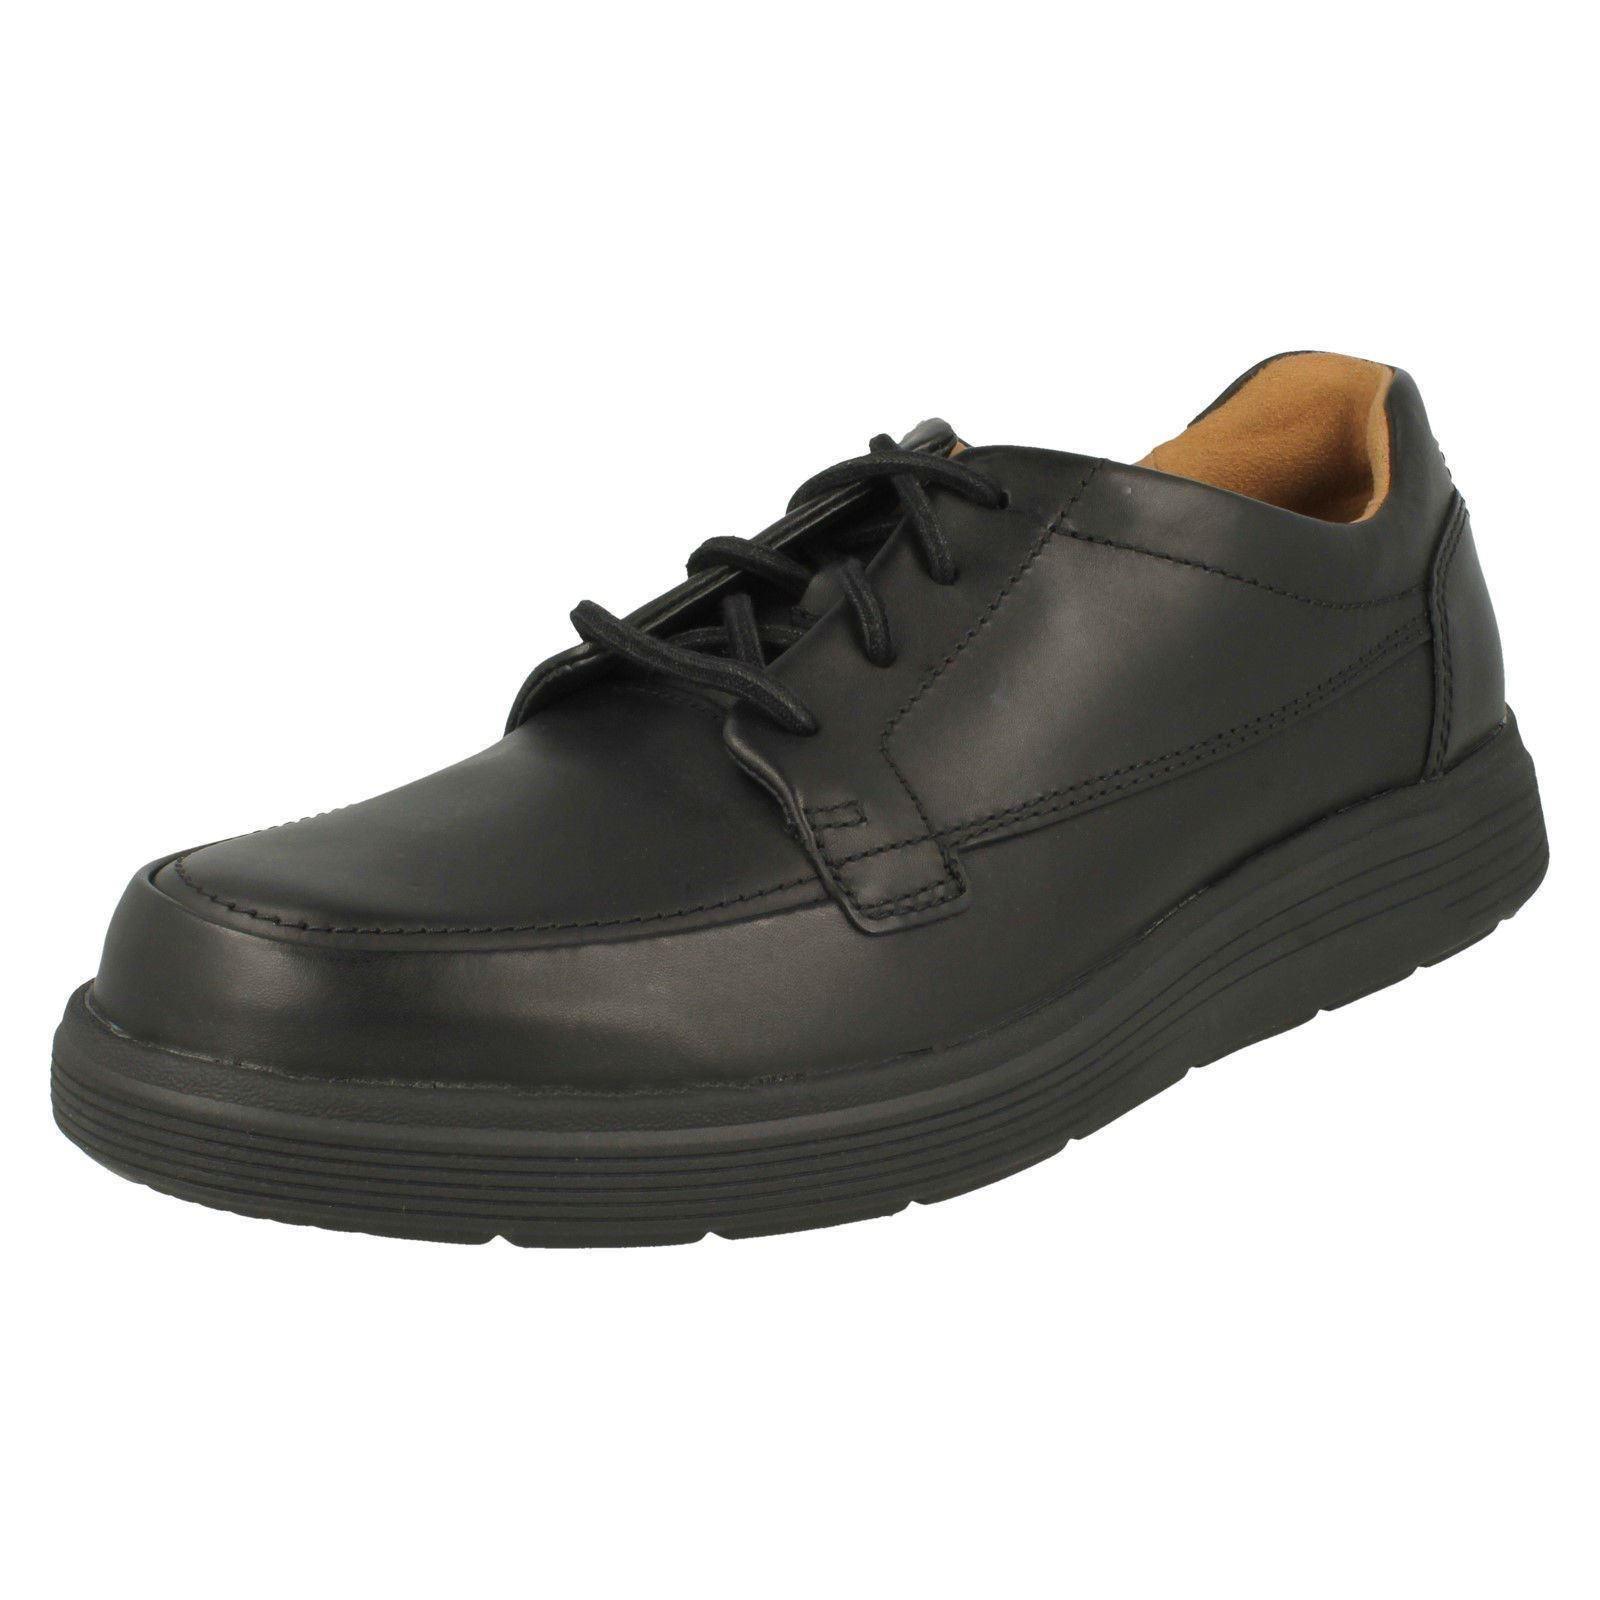 Clarks-Hombre-Zapatos-de-Vestir-con-Cordones-Onu-Abode-Ease